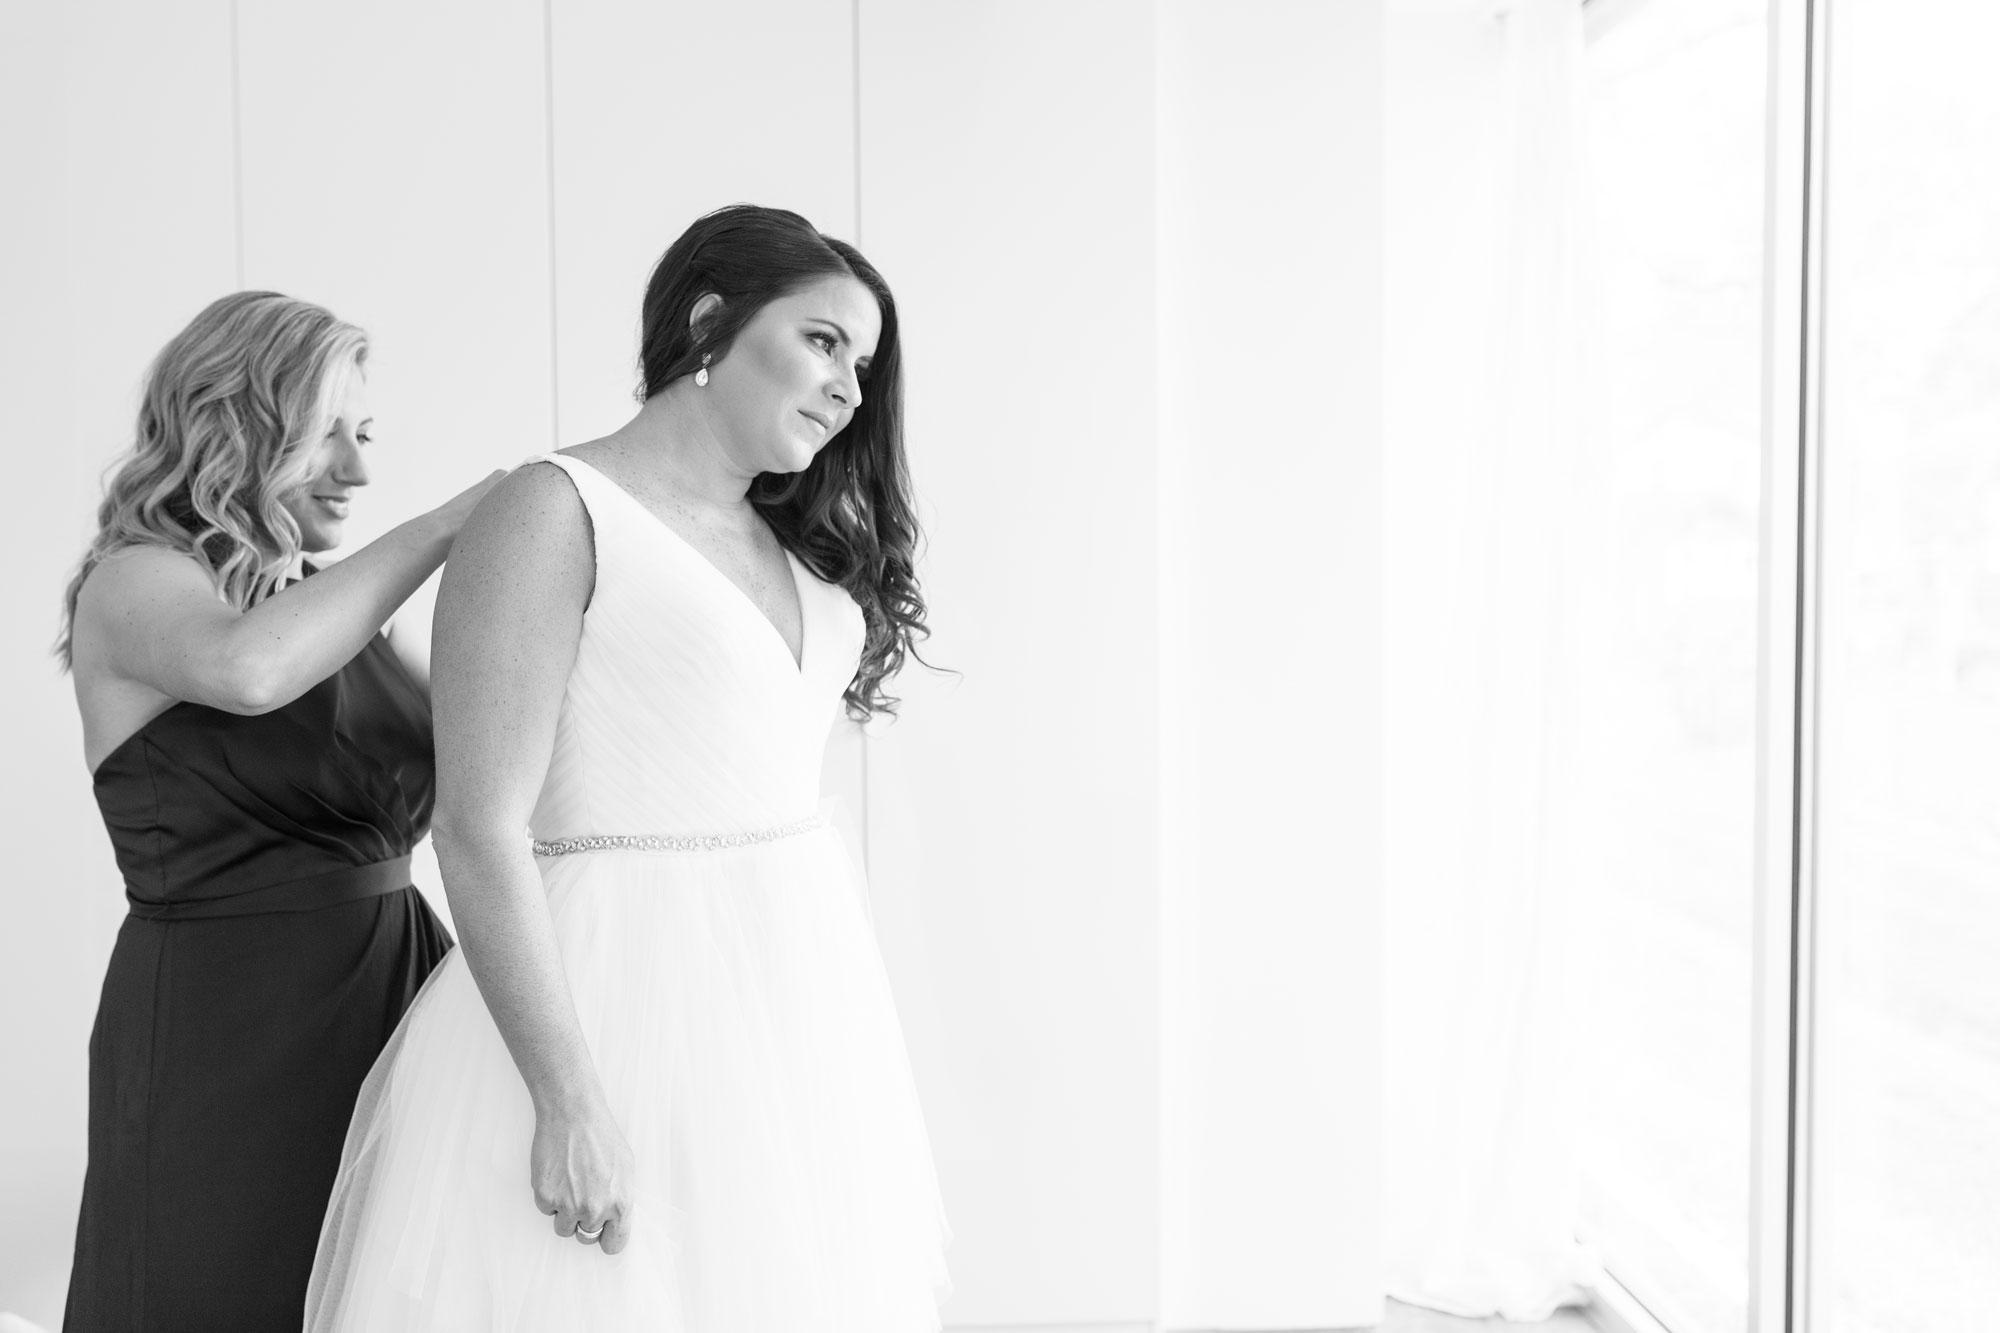 Konz-Bigaila-wedding-2017-18.jpg